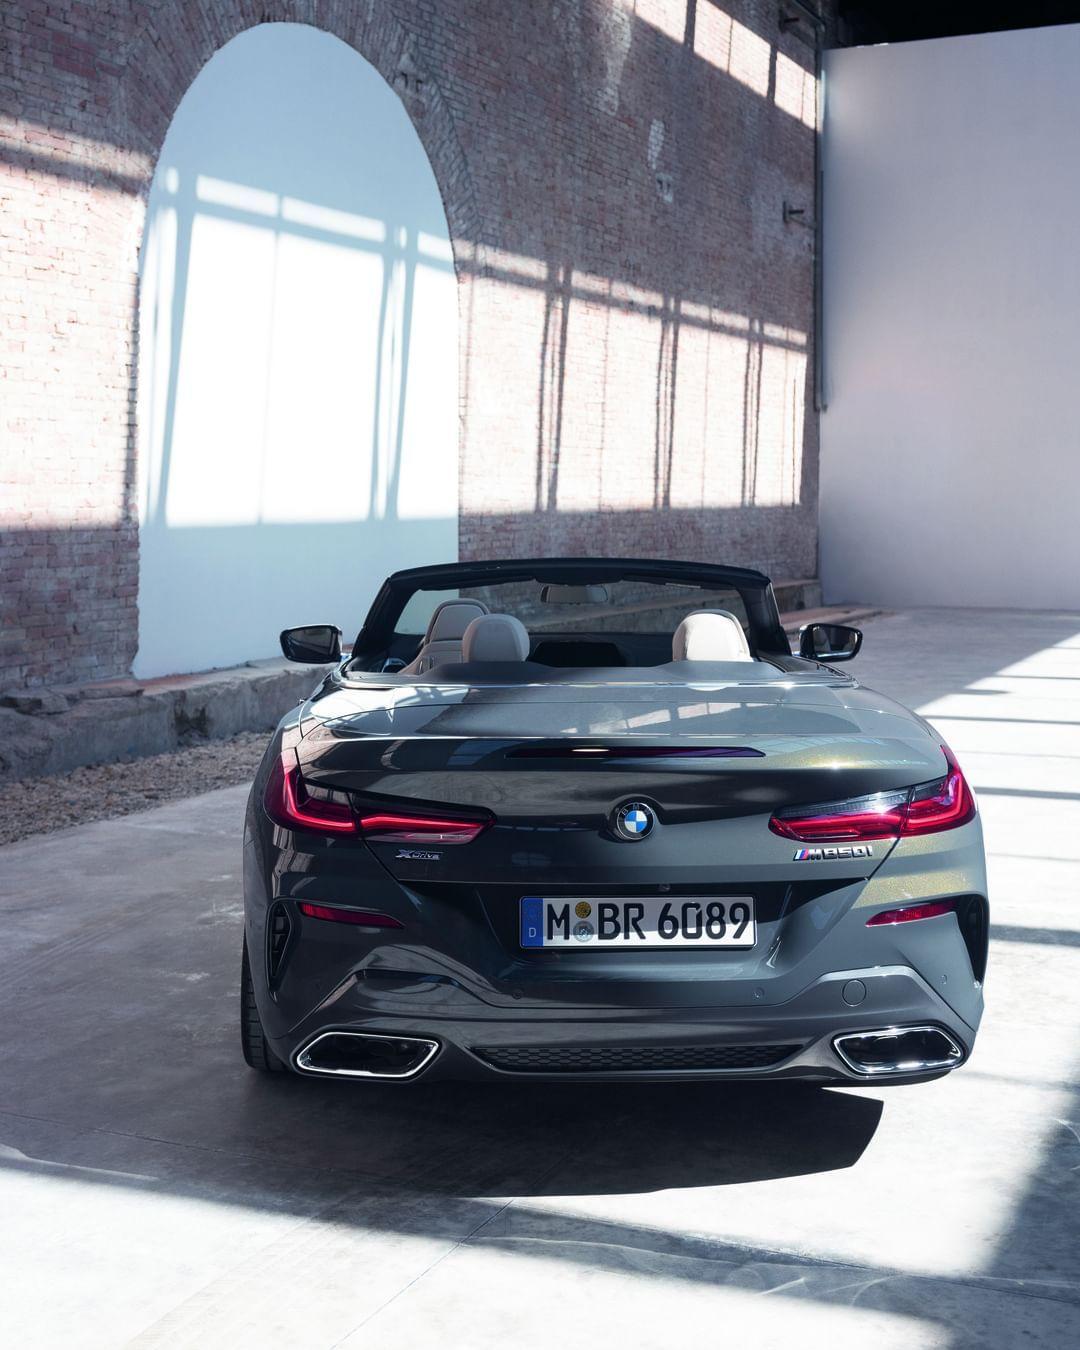 Redefining The Term Luxury Sports Car More Regram Via Bmw Bmw